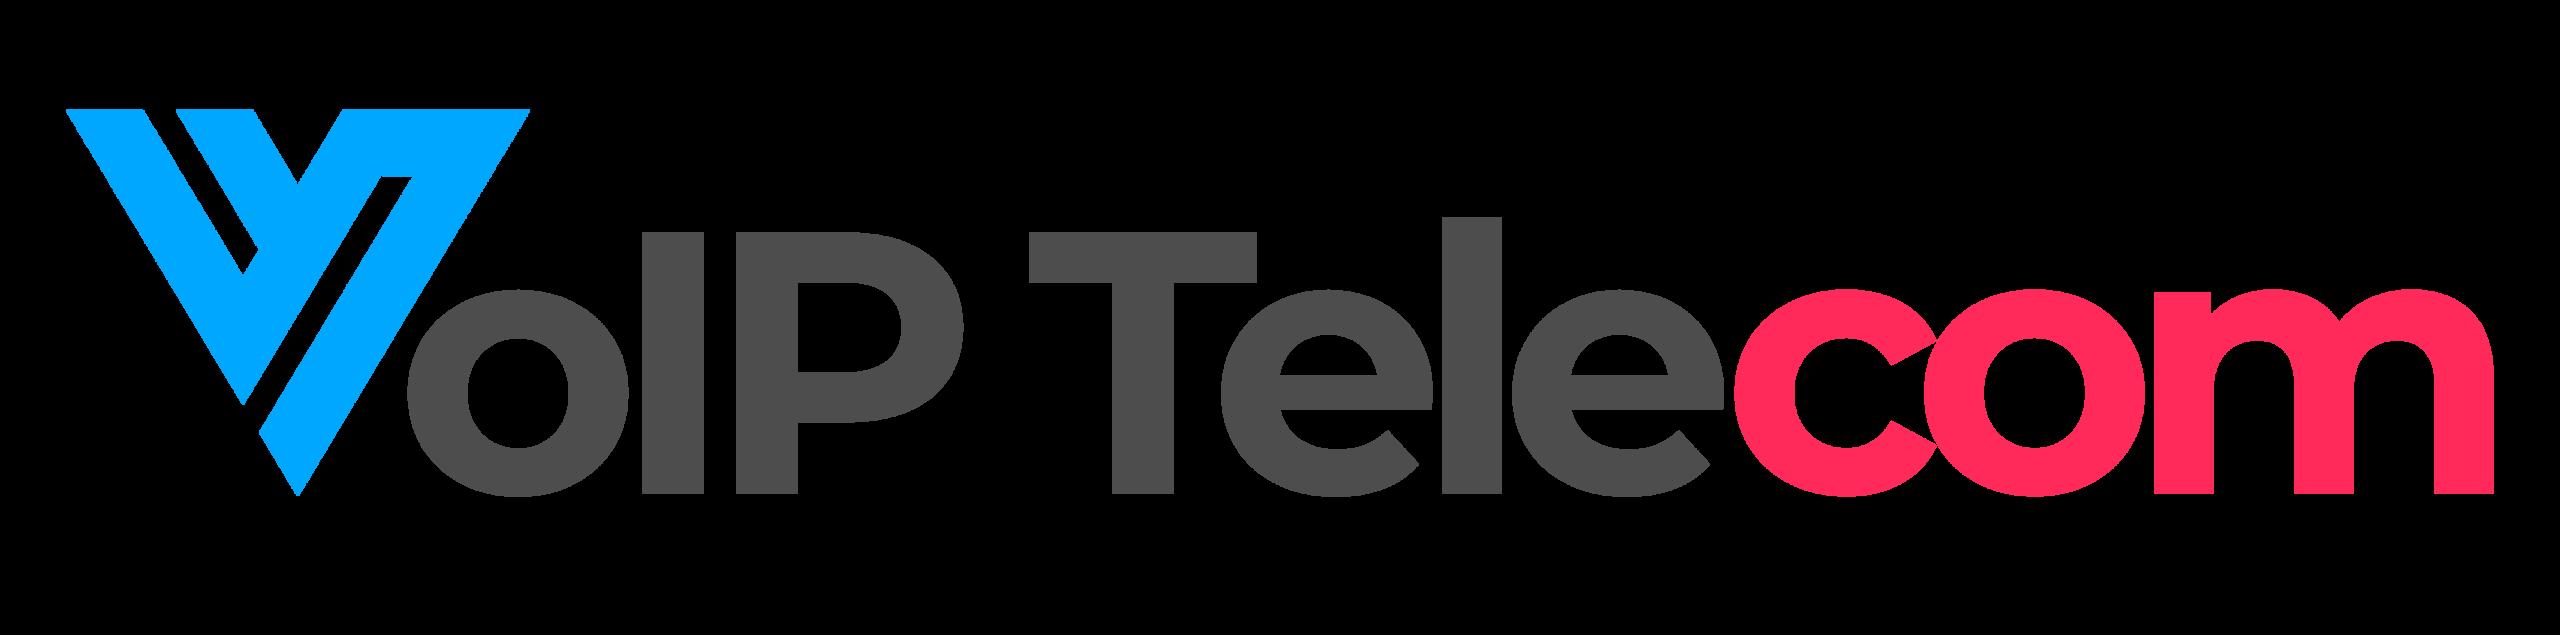 LogoVoipTelecom